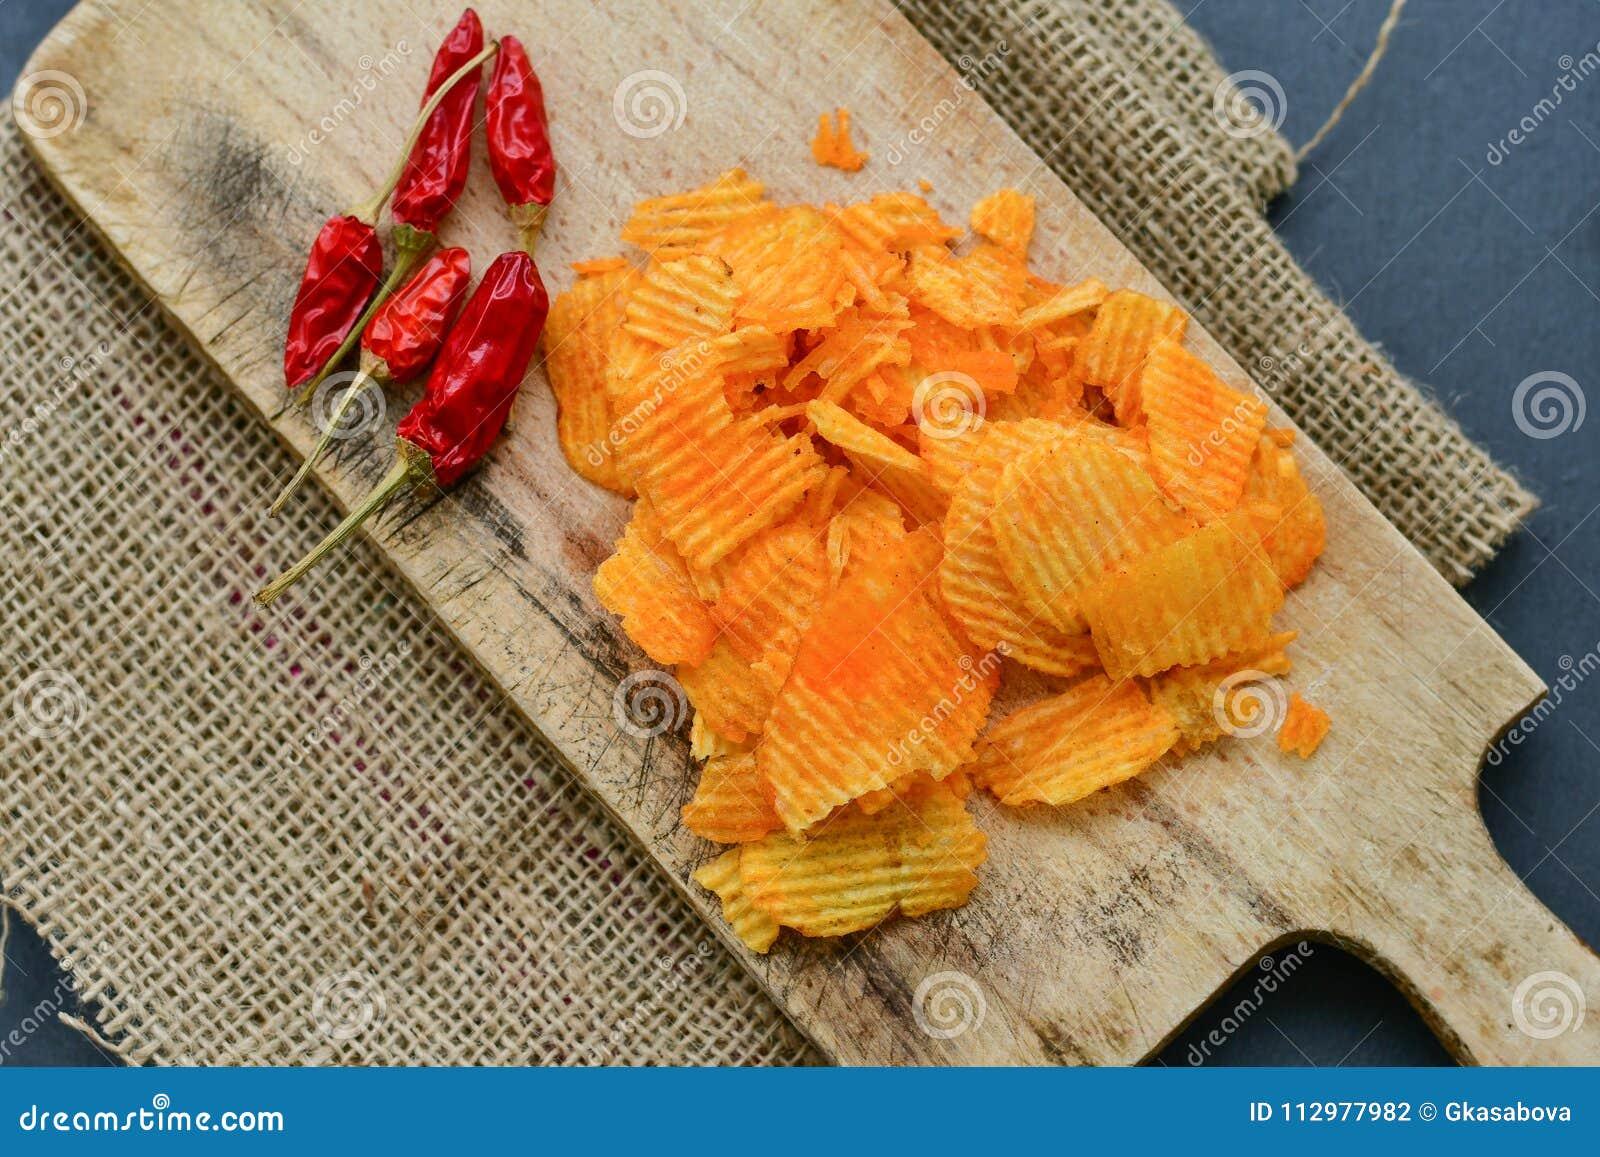 Paprika chips